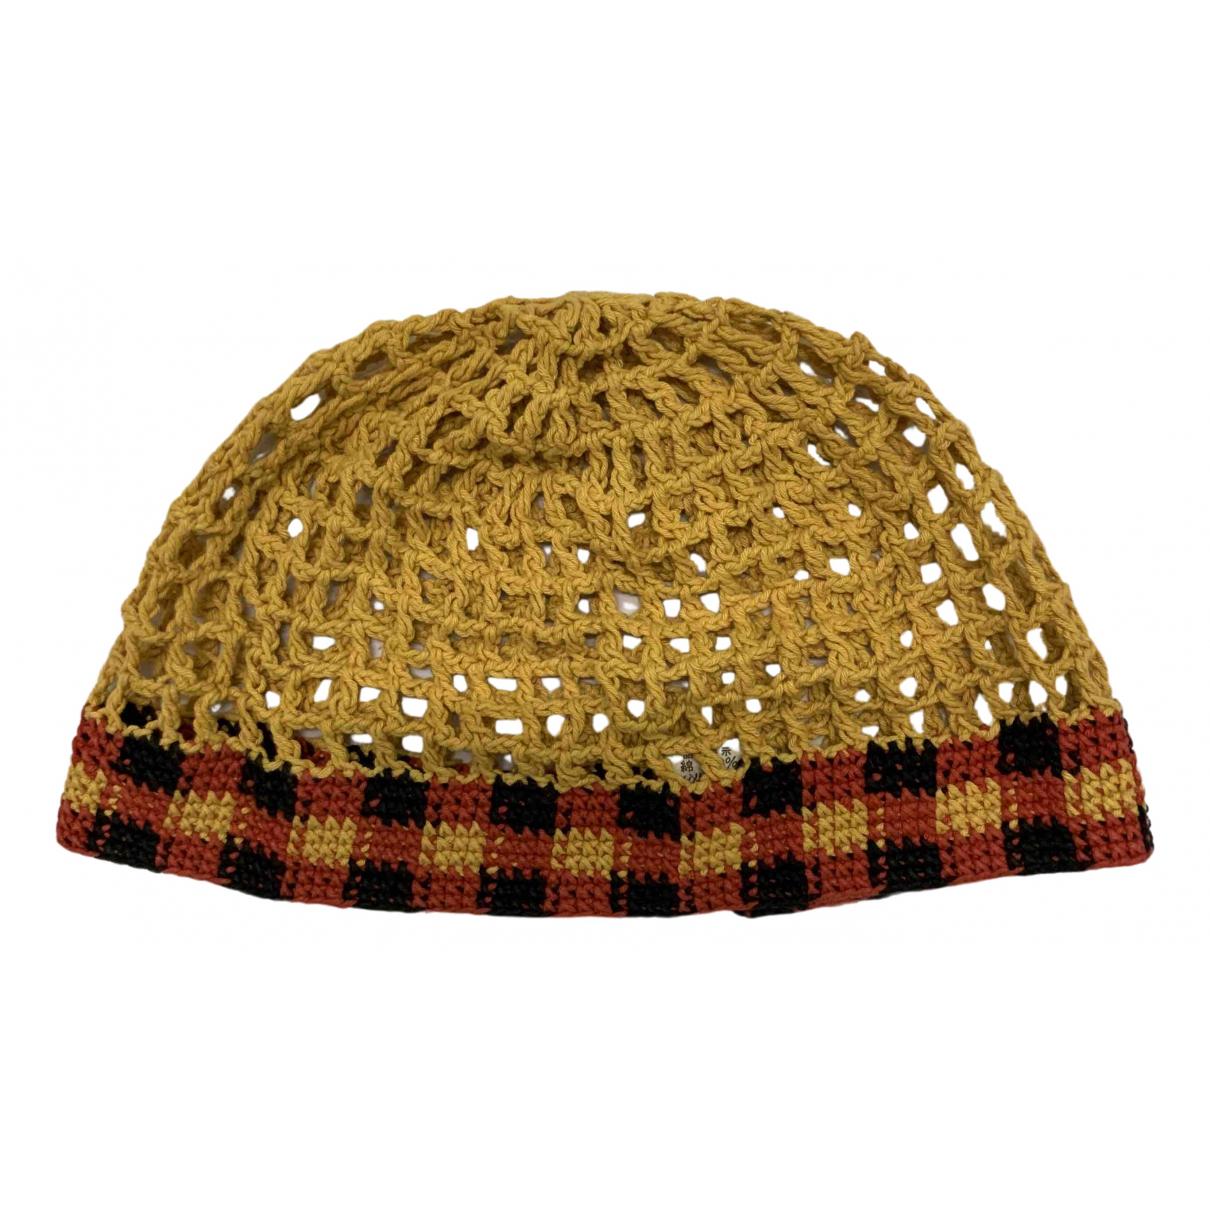 Sombrero / gorro de Lona Jean Paul Gaultier